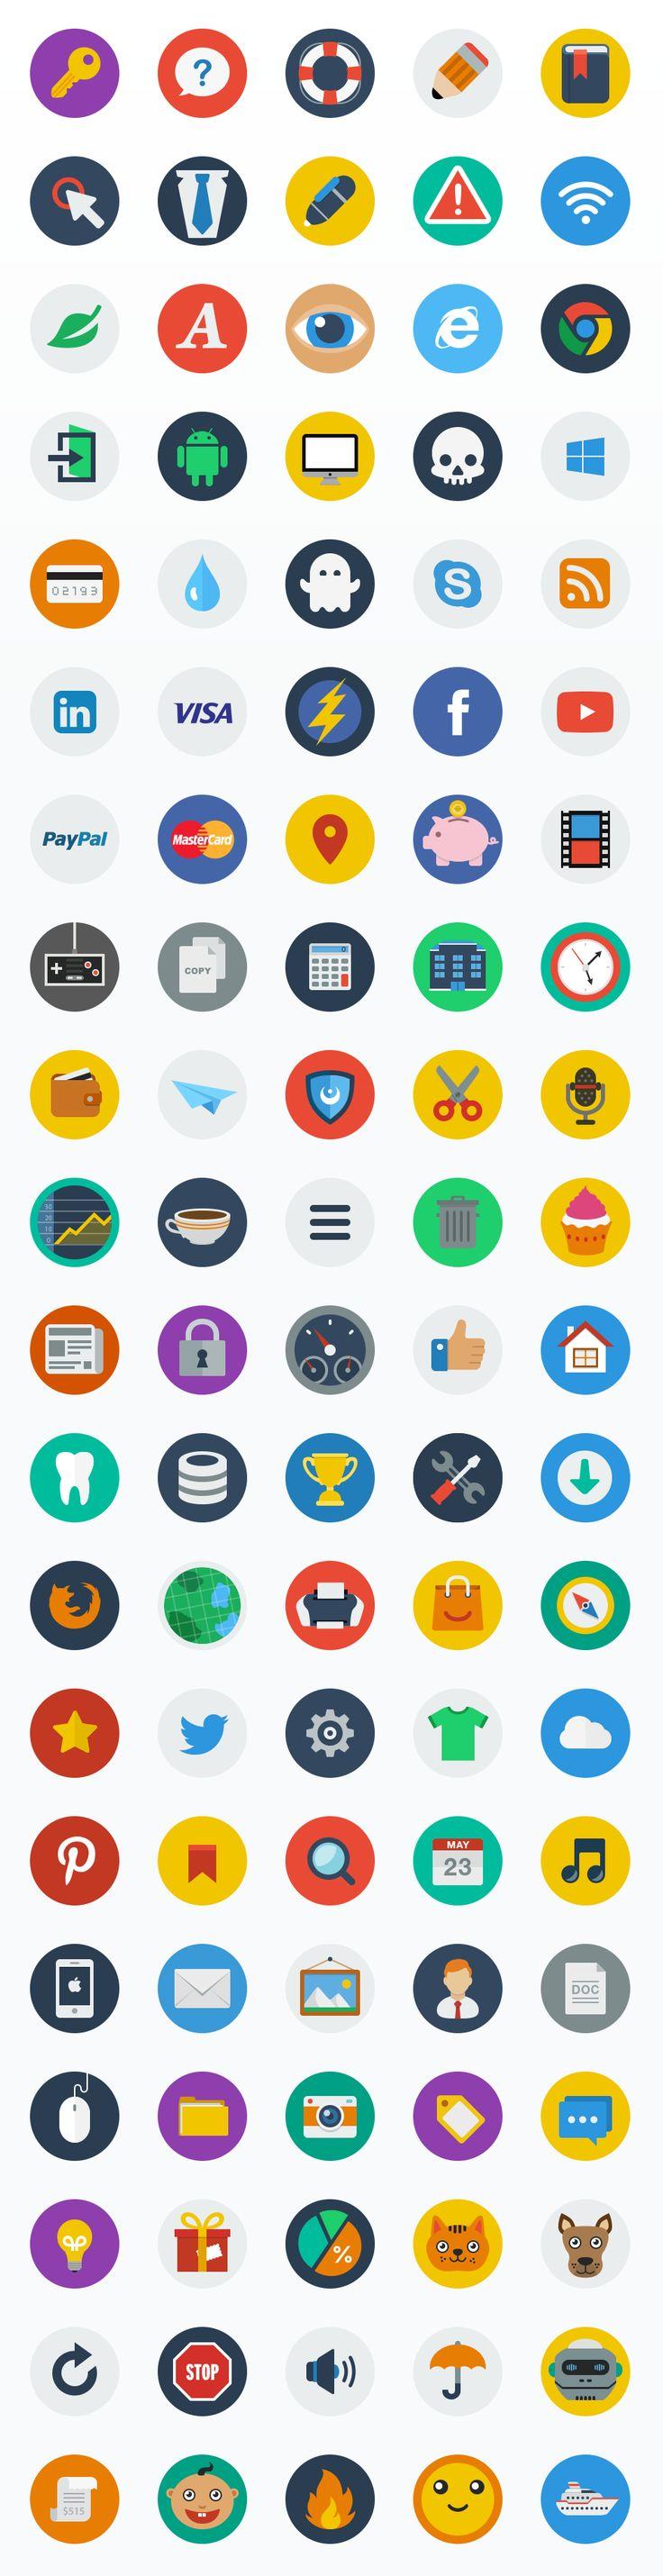 Flat Icon Set by Web Icon Set (via Creattica)